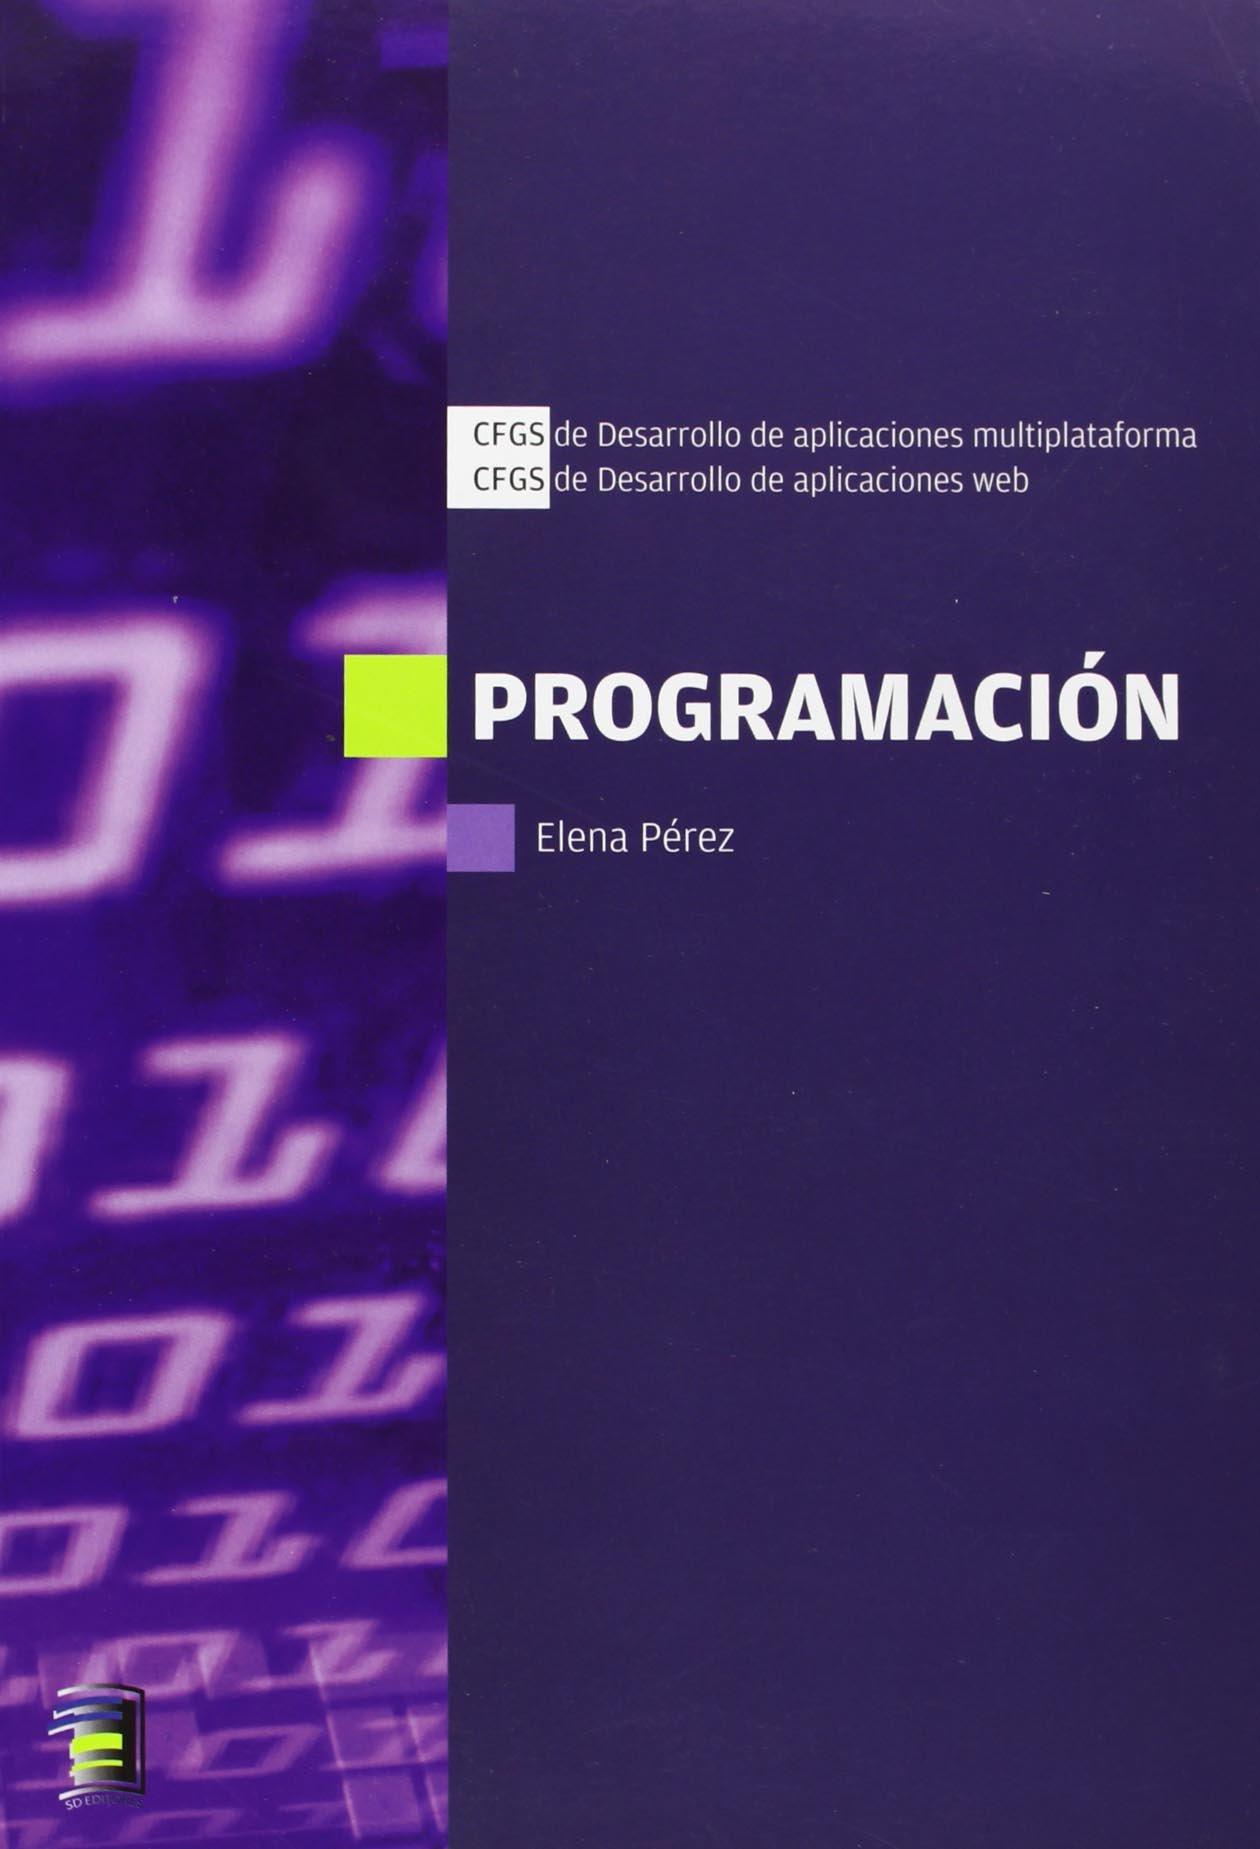 Programación. CFGS Tapa blanda – 10 oct 2012 Elena Pérez Nebreda Altamar 8493801798 Operating systems